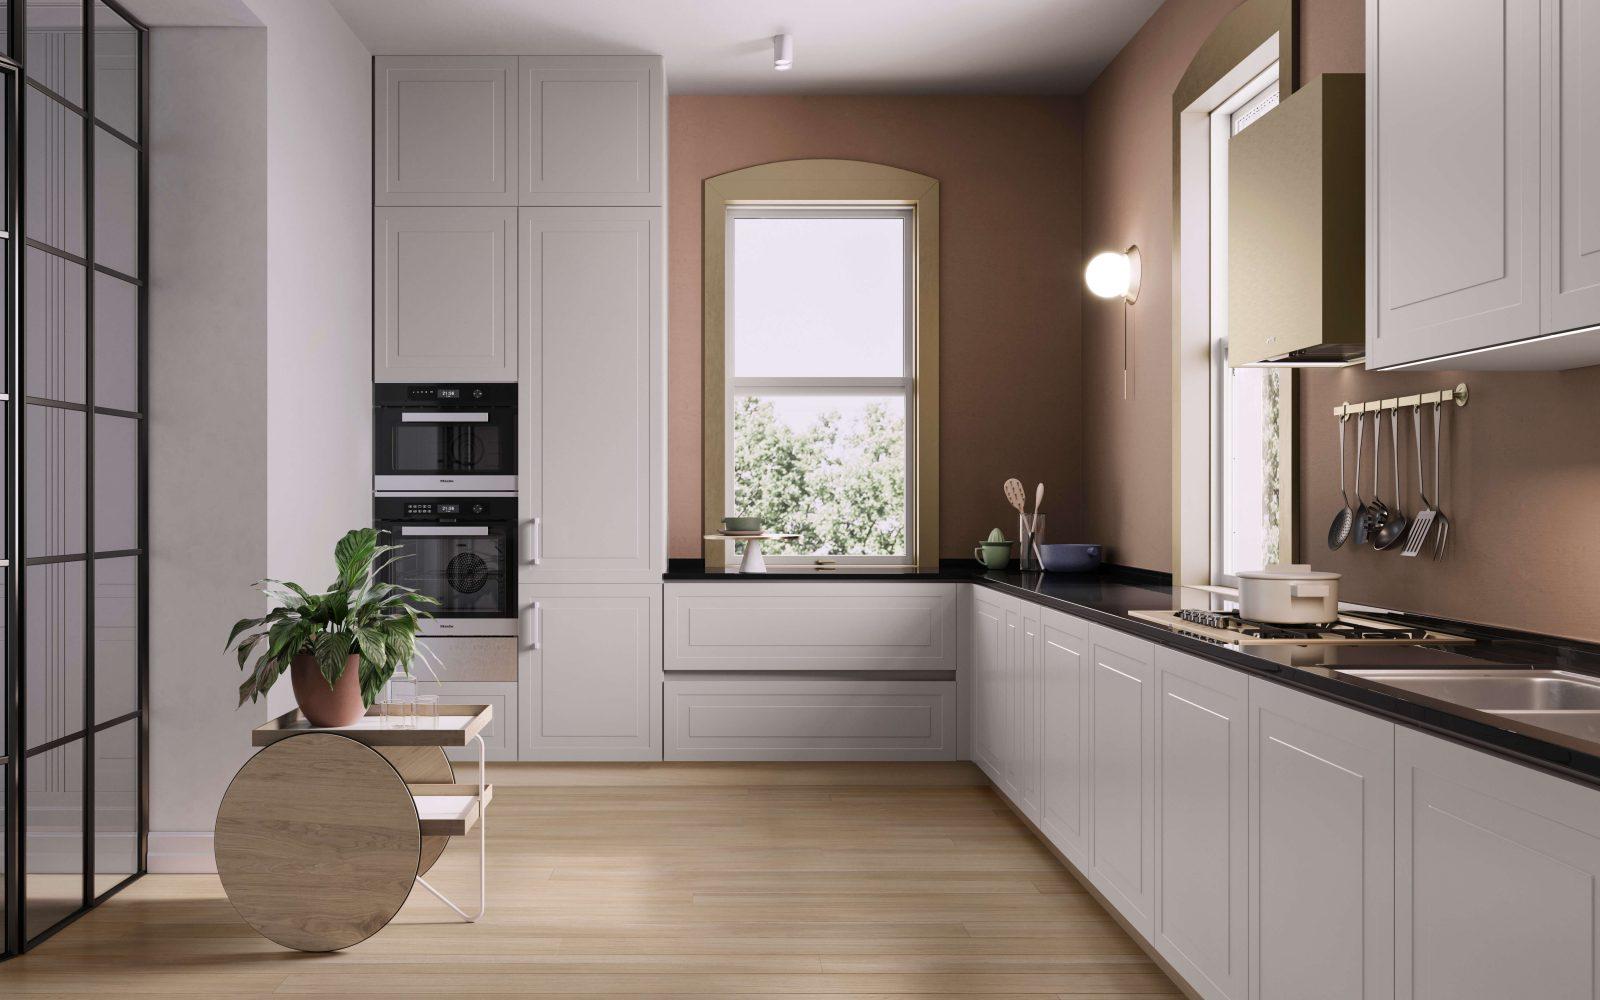 Boiserie pantografata e porta a vetri Garofoli per cucina classica - Garofoli